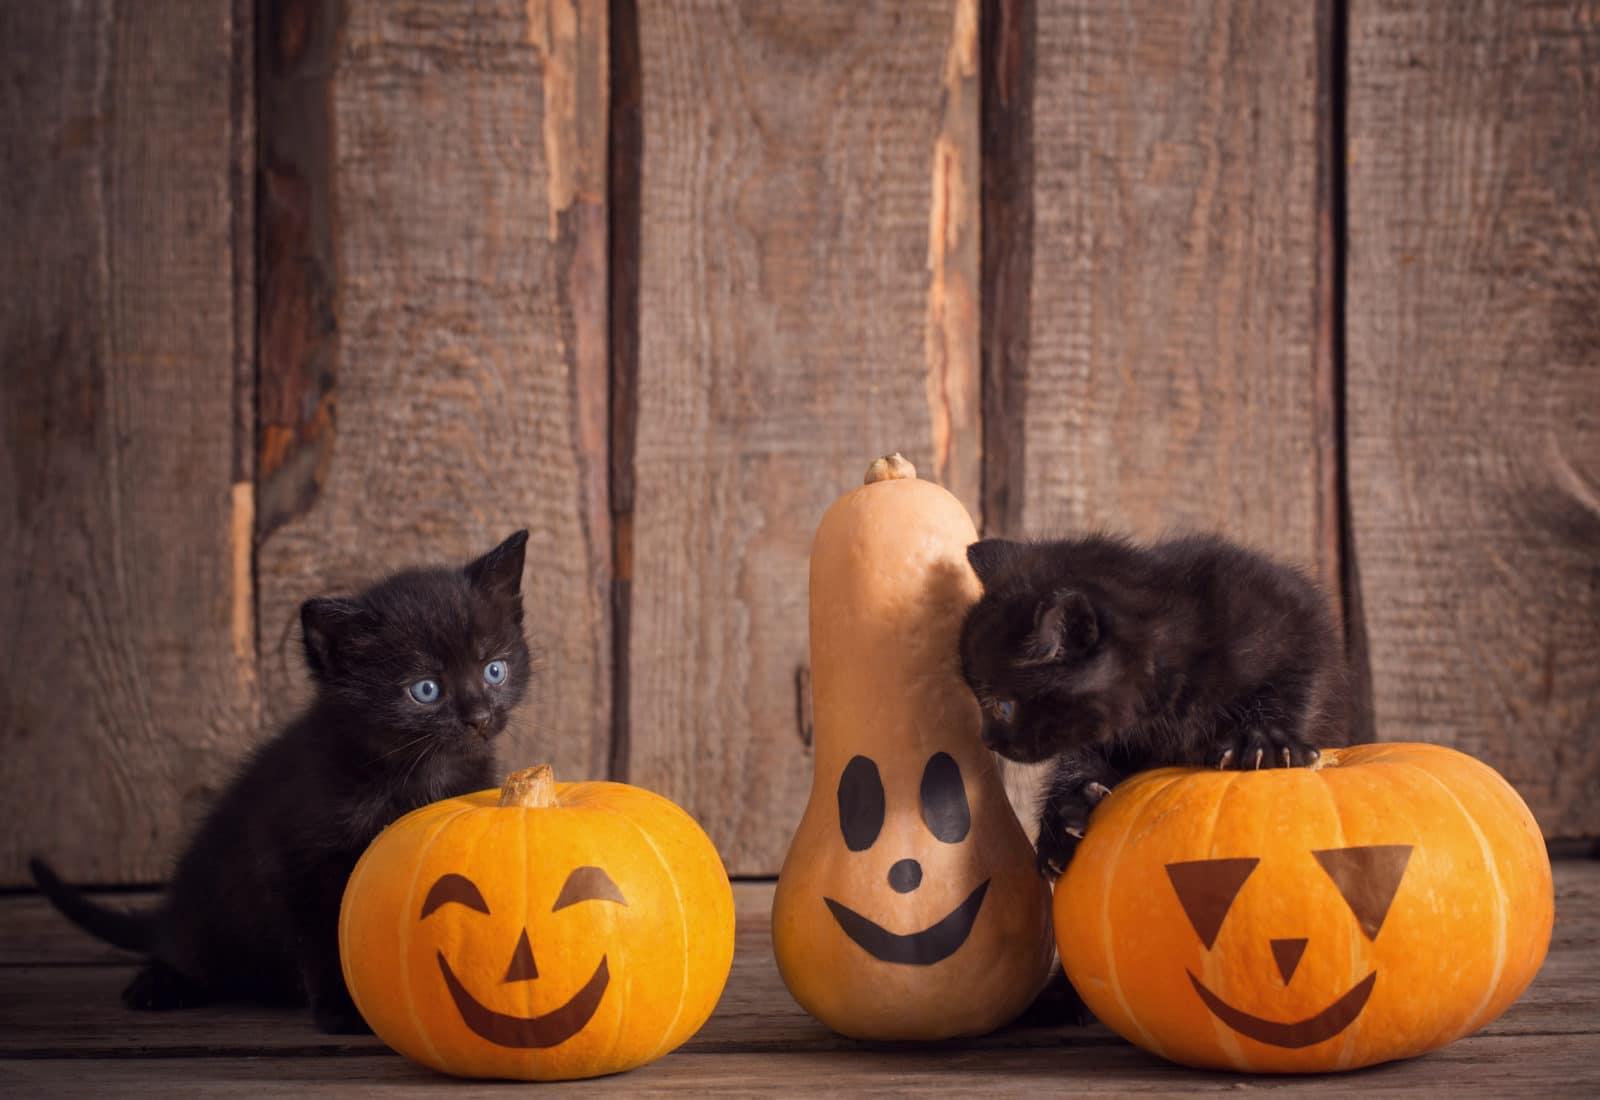 Boo-tacular Hacks: Halloween and Chronic Pain